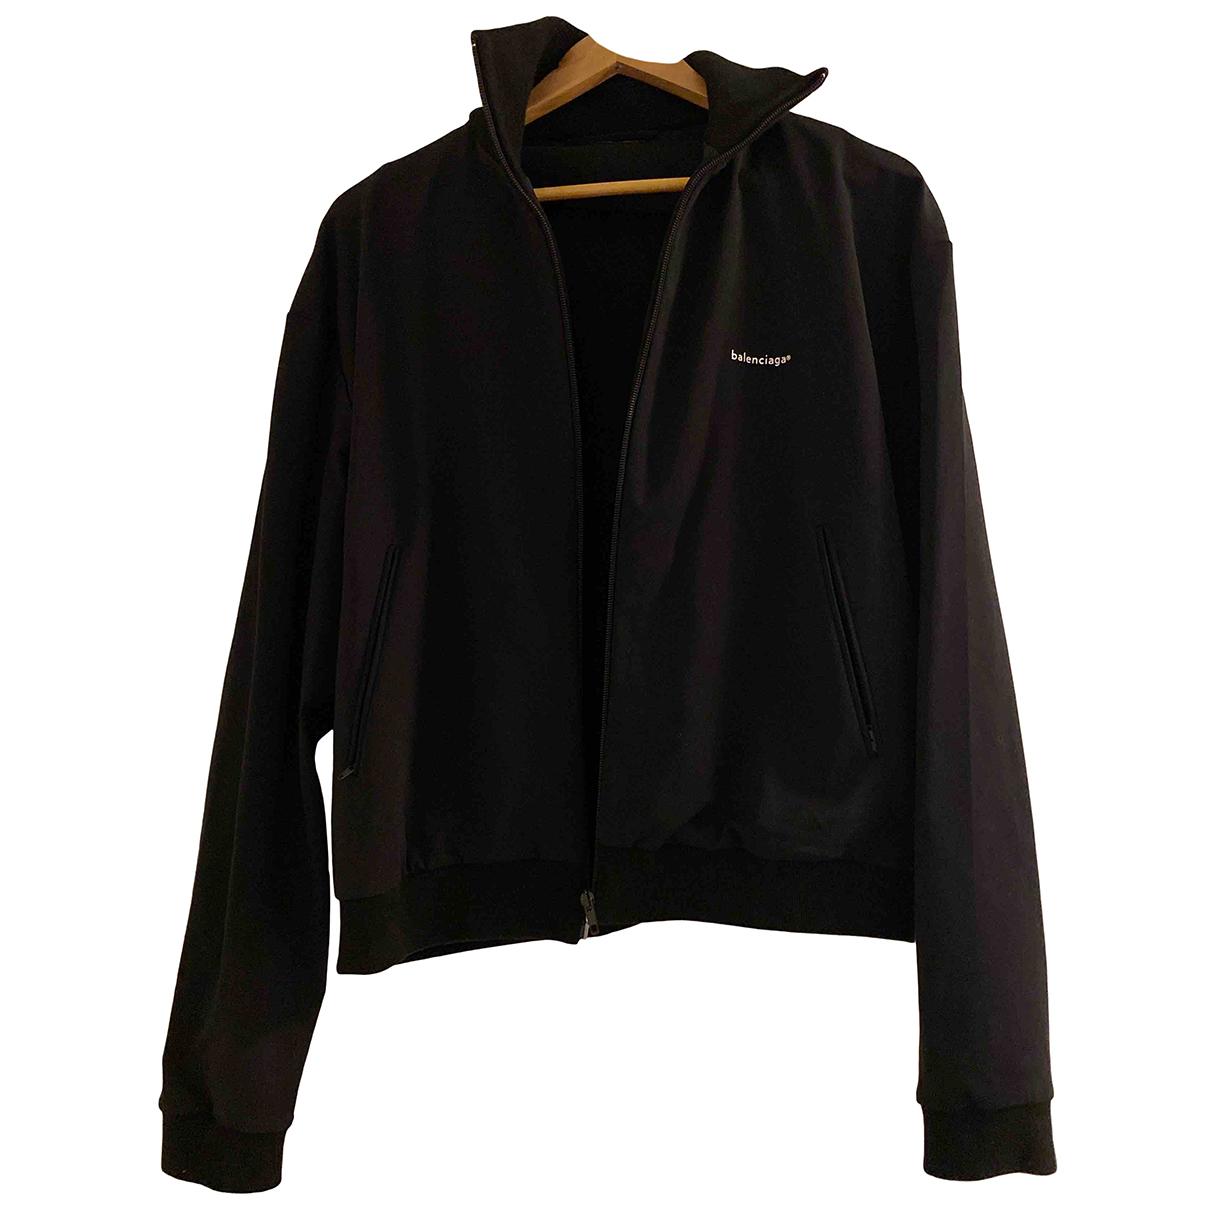 Balenciaga N Black jacket  for Men 52 IT